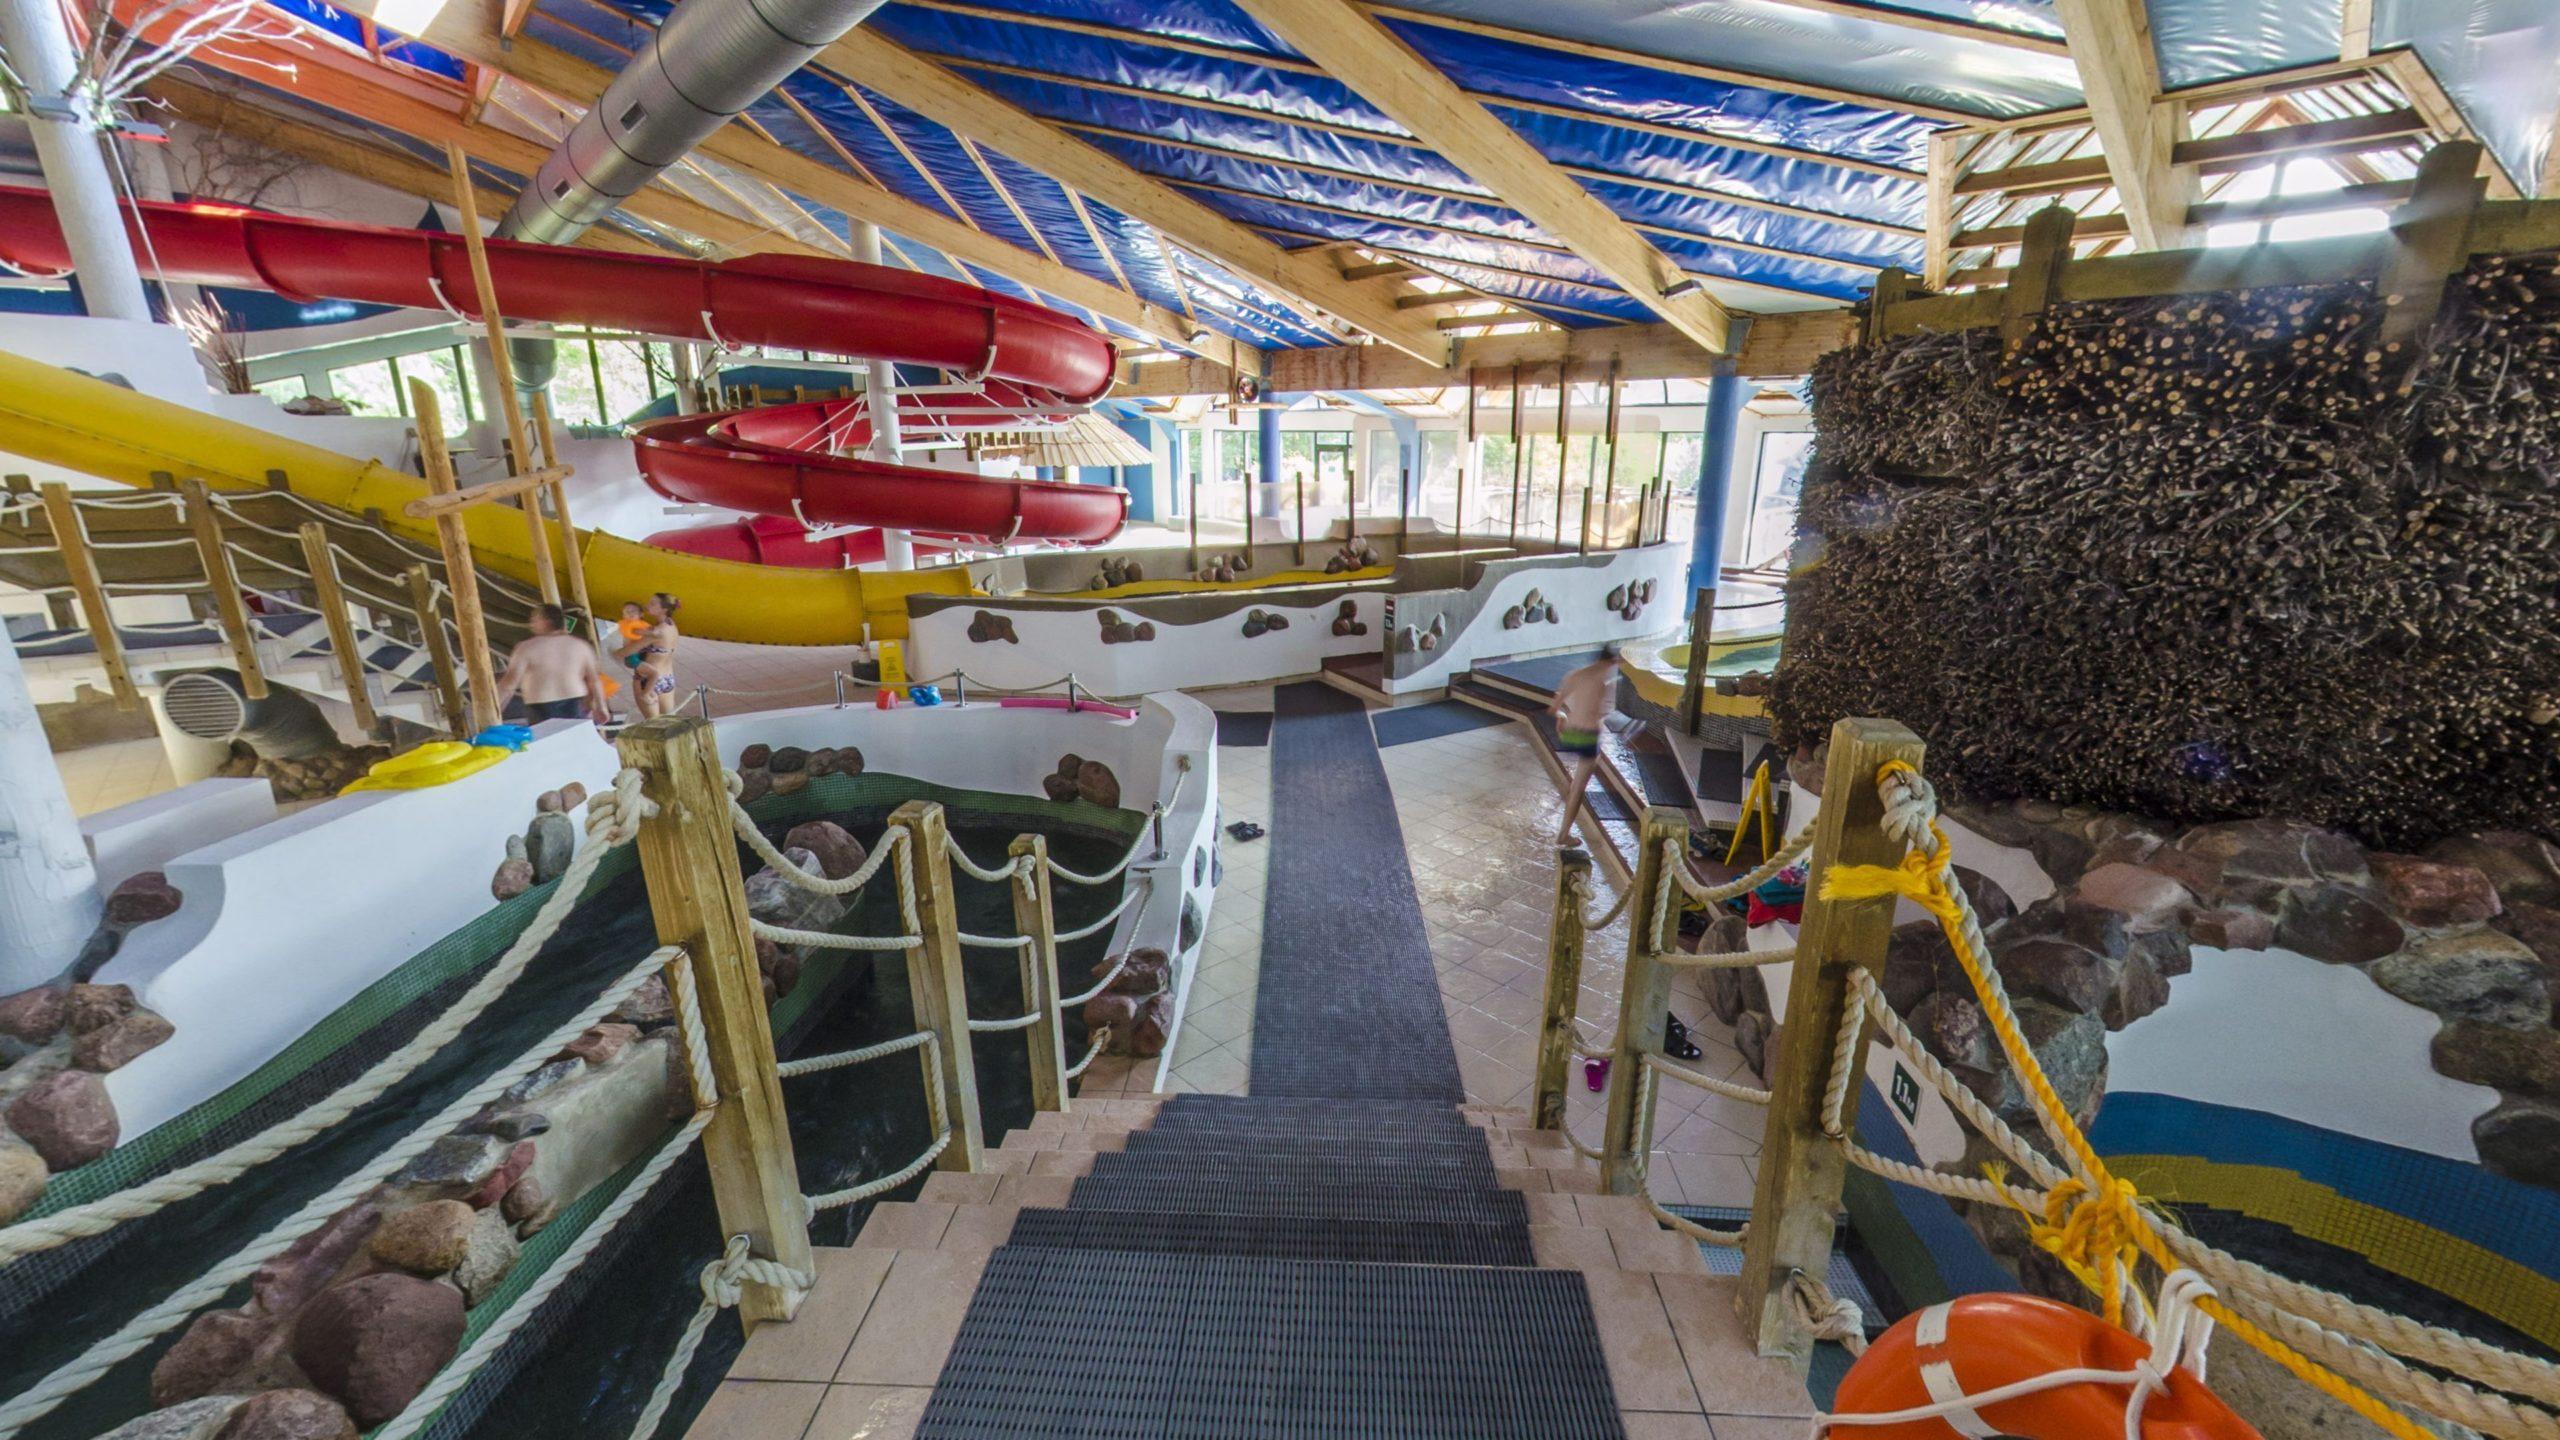 Virtual Tour of the Waterpark in Olsztyn, Poland.